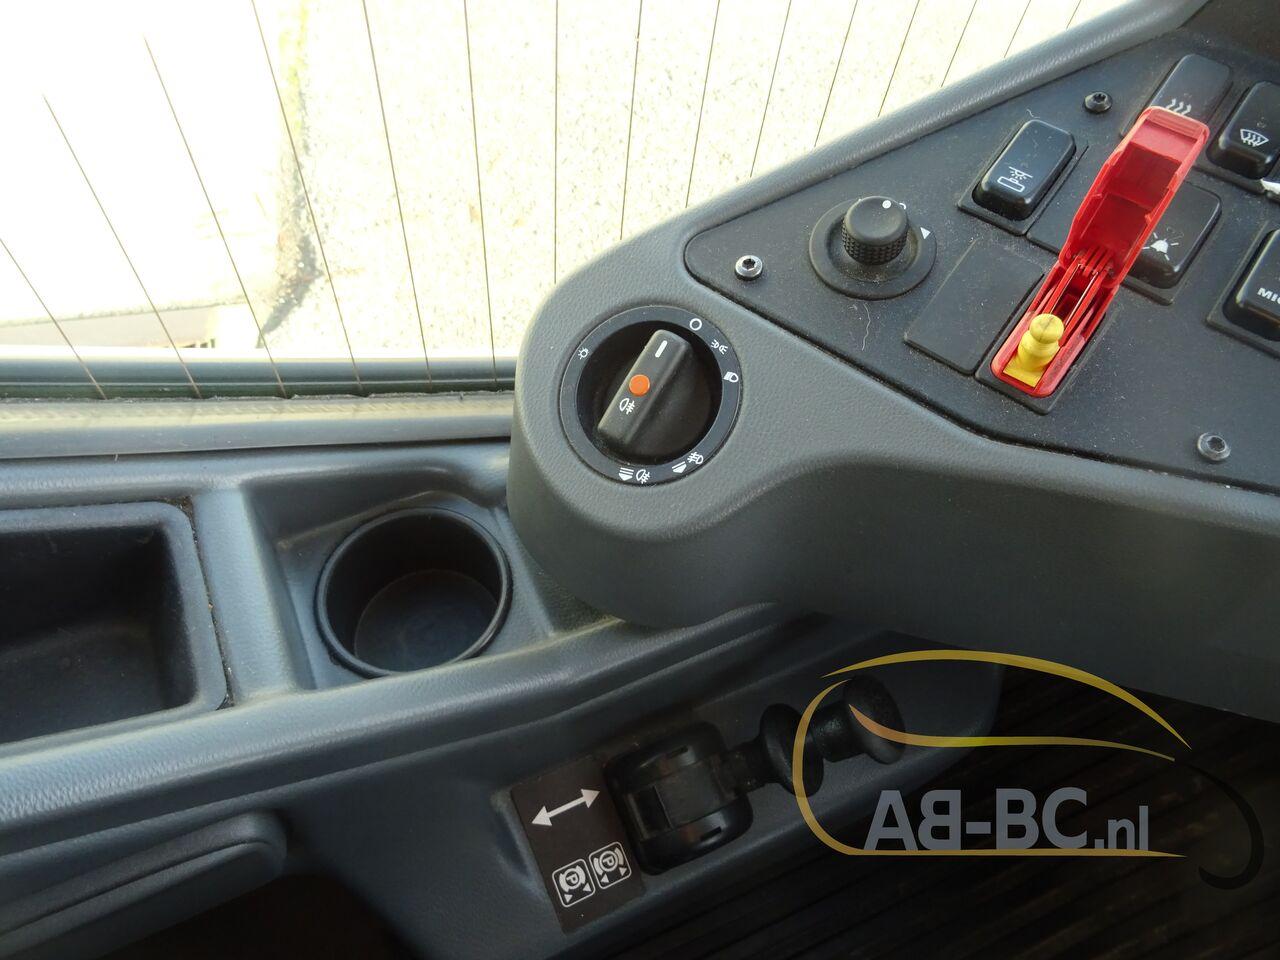 coach-bus-SETRA-S415H-52-Seats-EURO-6-Liftbus---1630913342700098935_big_754df97fdd9a0533e6d20708def444ce--21070517141280735500